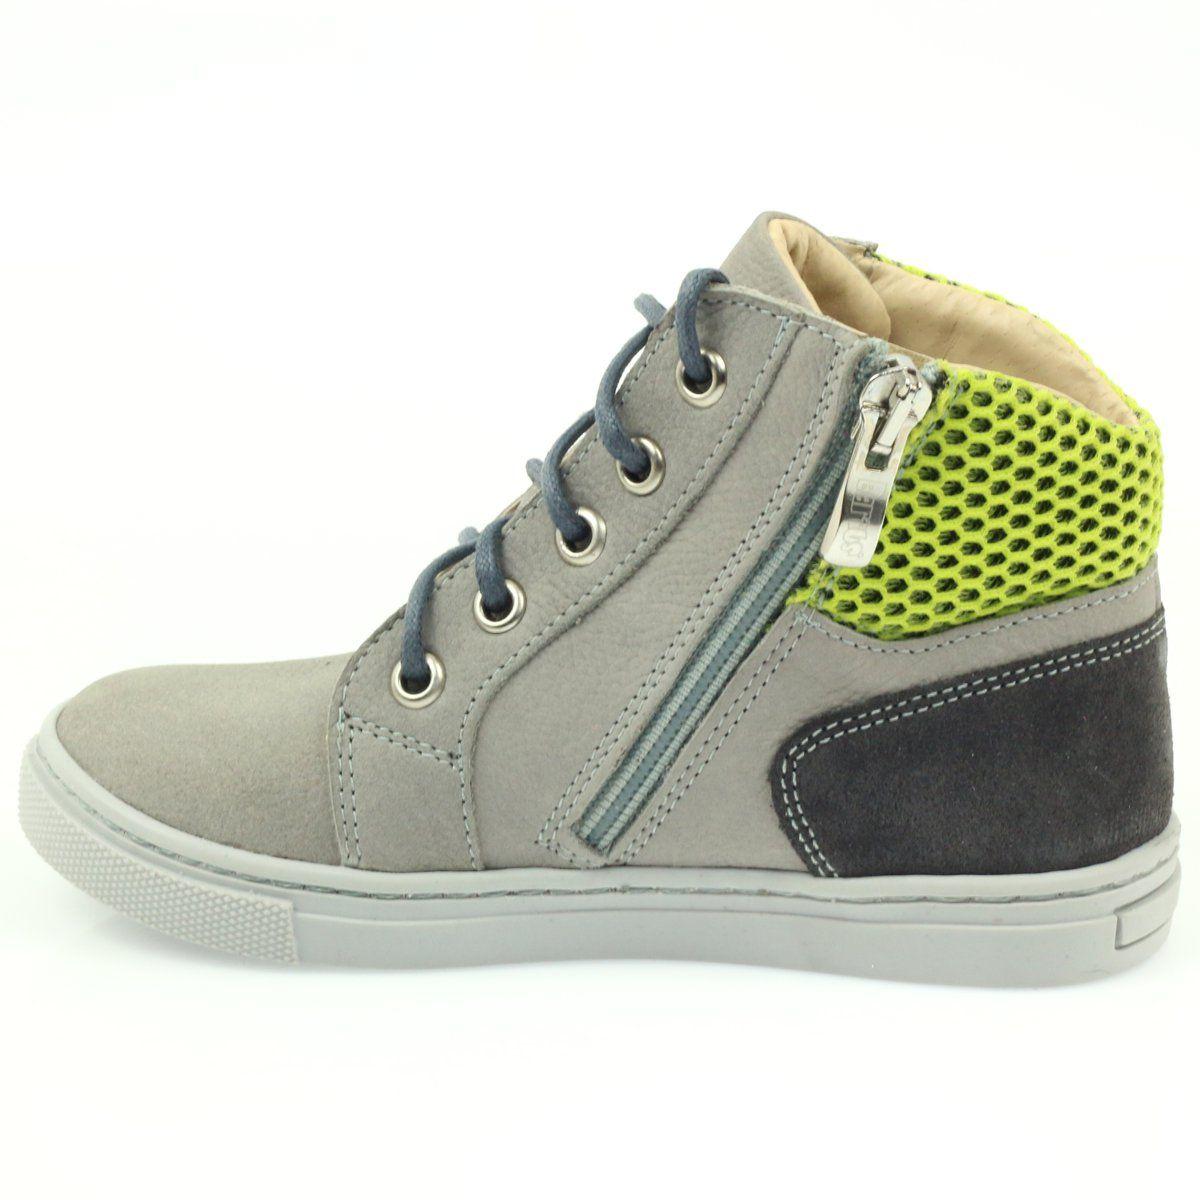 Trzewiki Jesienne Na Suwak Bartus 186 Szare Zielone High Top Sneakers Sneakers Shoes